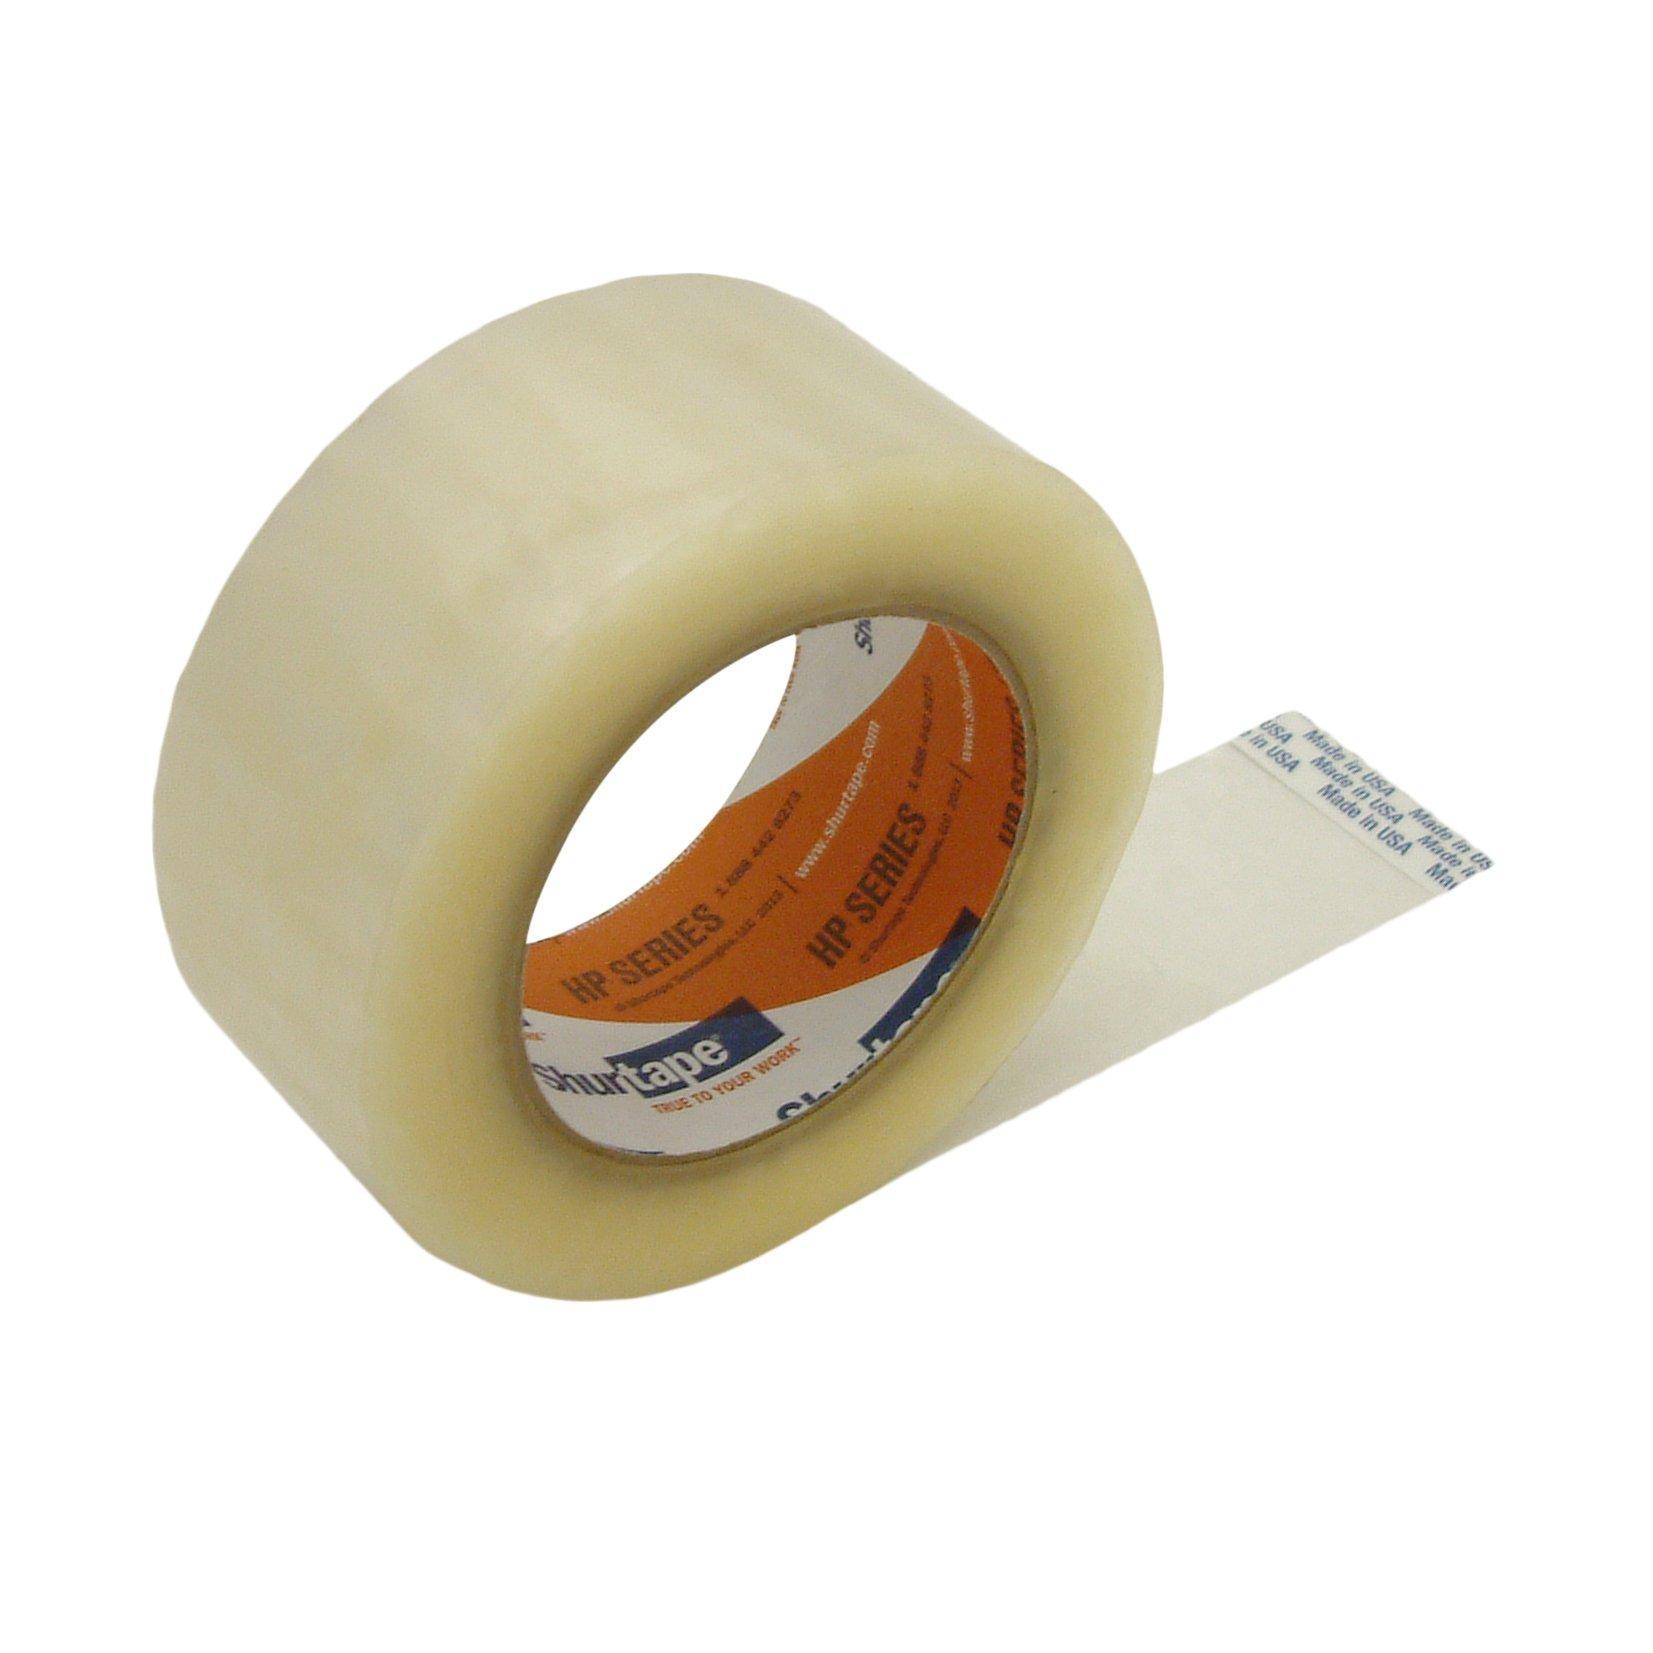 Shurtape HP-400/CLR2110 Shurtape HP-400 High-Performance Grade Packaging Tape: 2'' x 110 yd, Clear